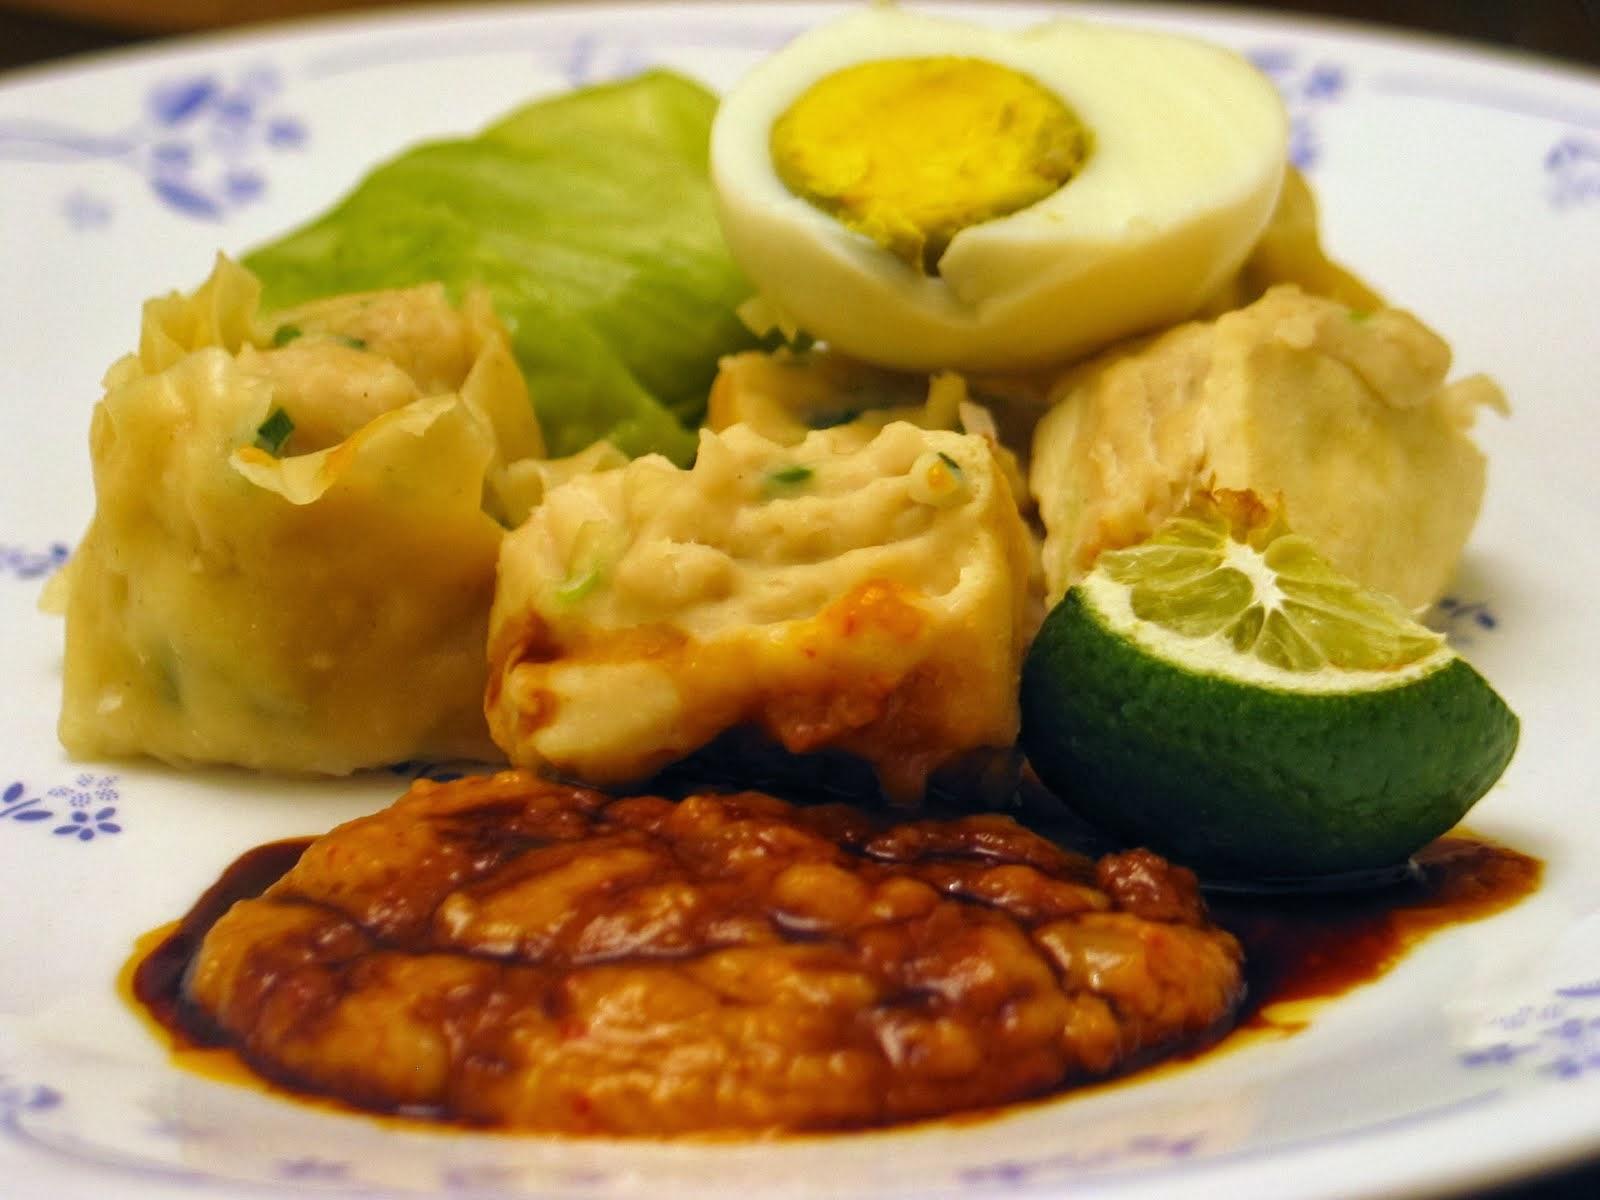 Resep Siomay Bandung bumbu kacang enak | Aneka Resep